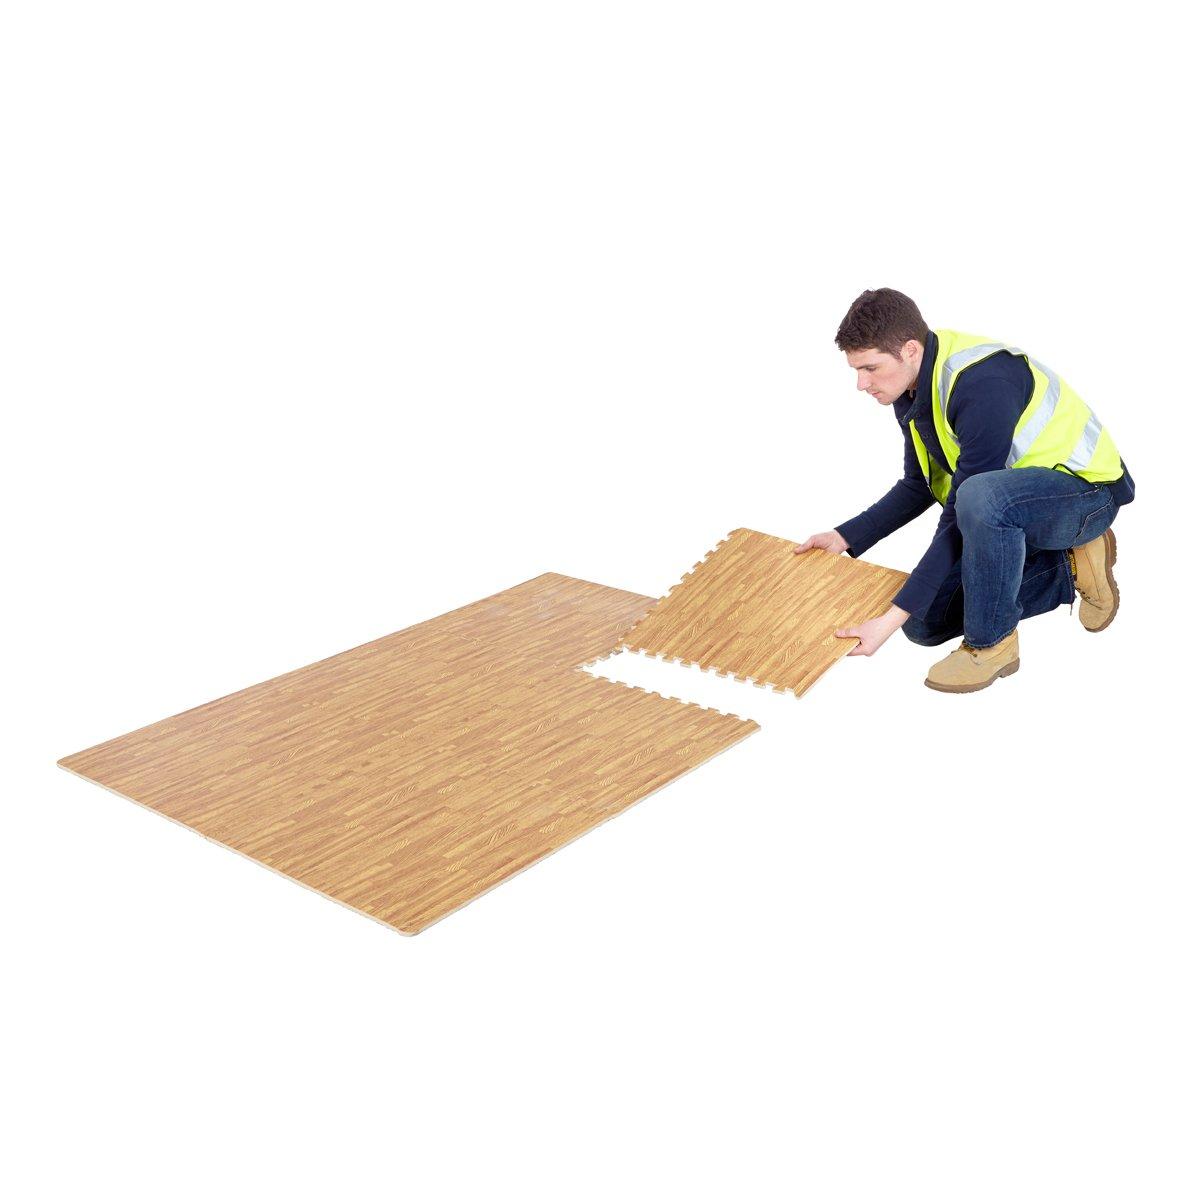 Wood effect interlocking floor tiles pack of 6 eva foam flooring wood effect interlocking floor tiles pack of 6 eva foam flooring exercise mats gym garage house amazon diy tools doublecrazyfo Image collections